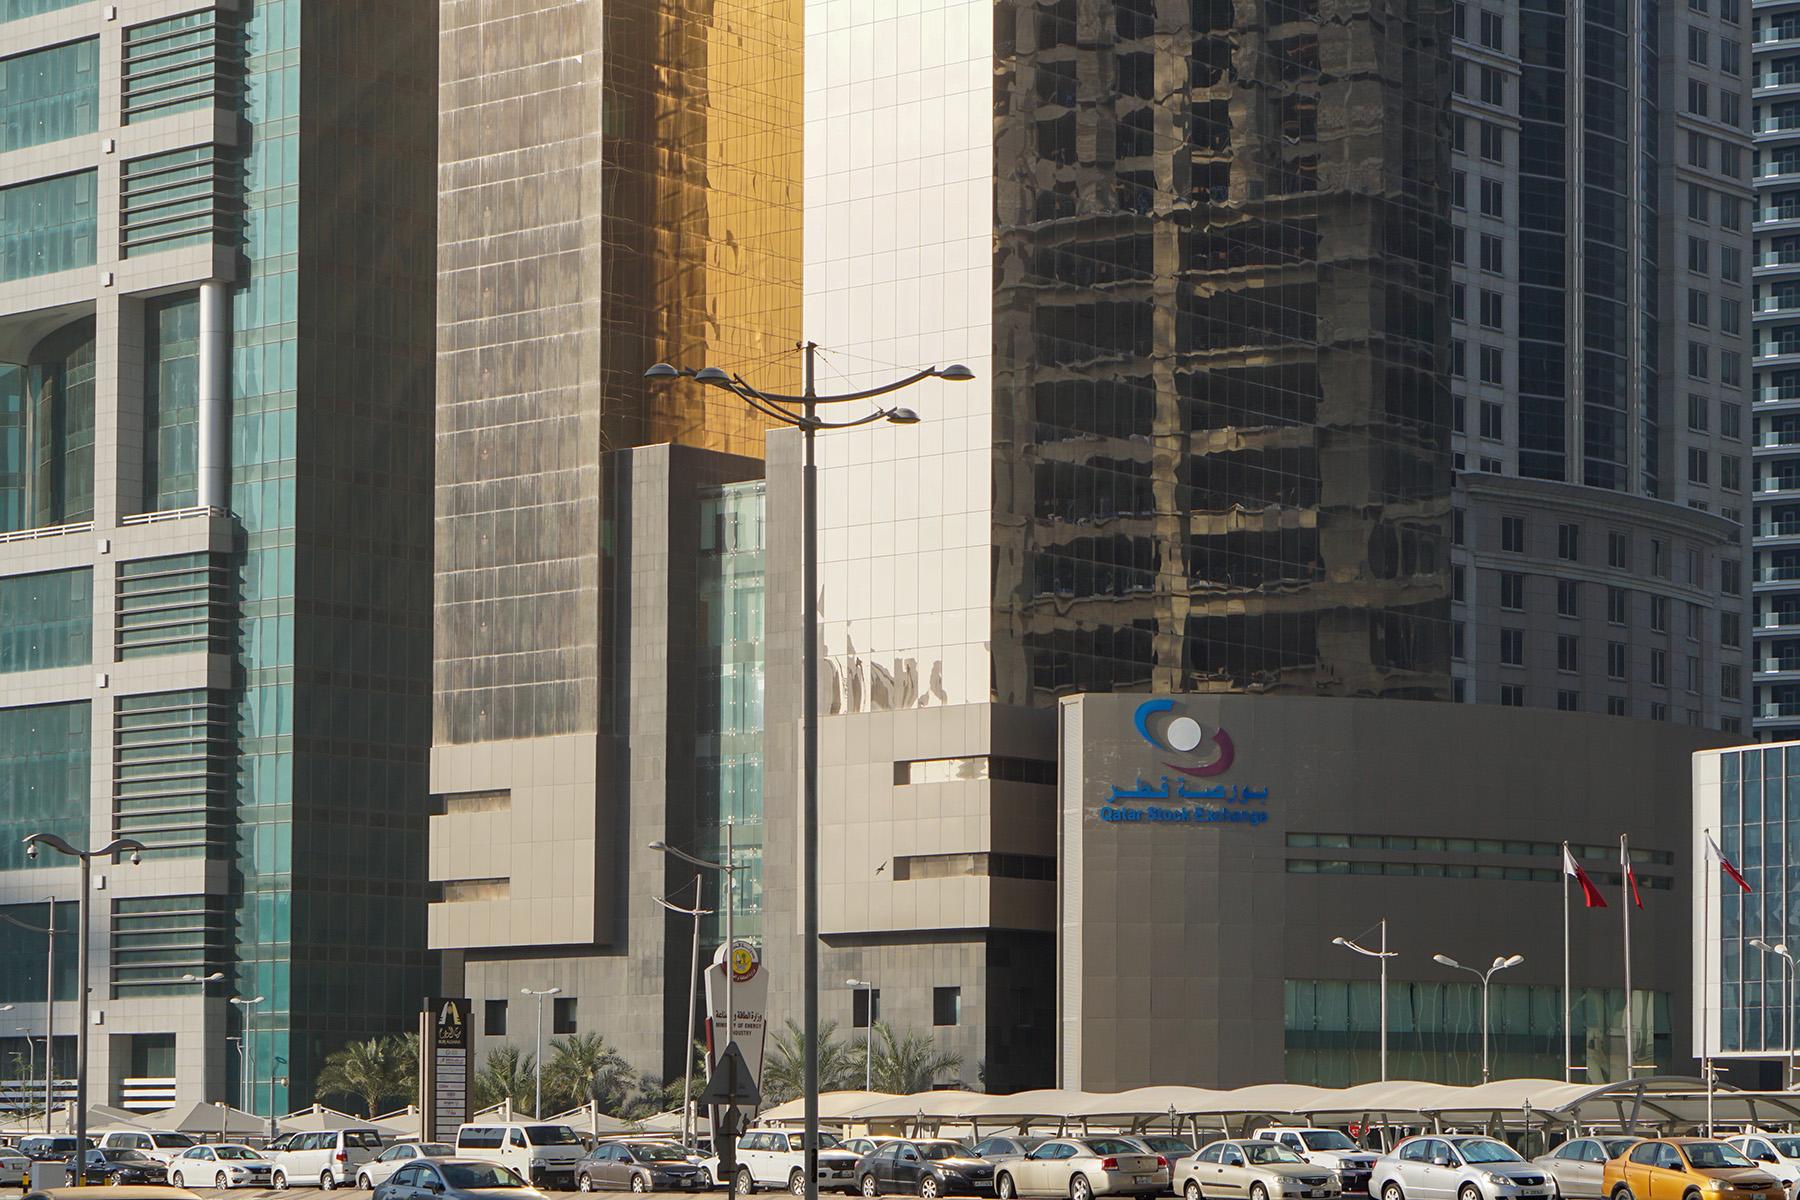 Qatar Stock Exchange building